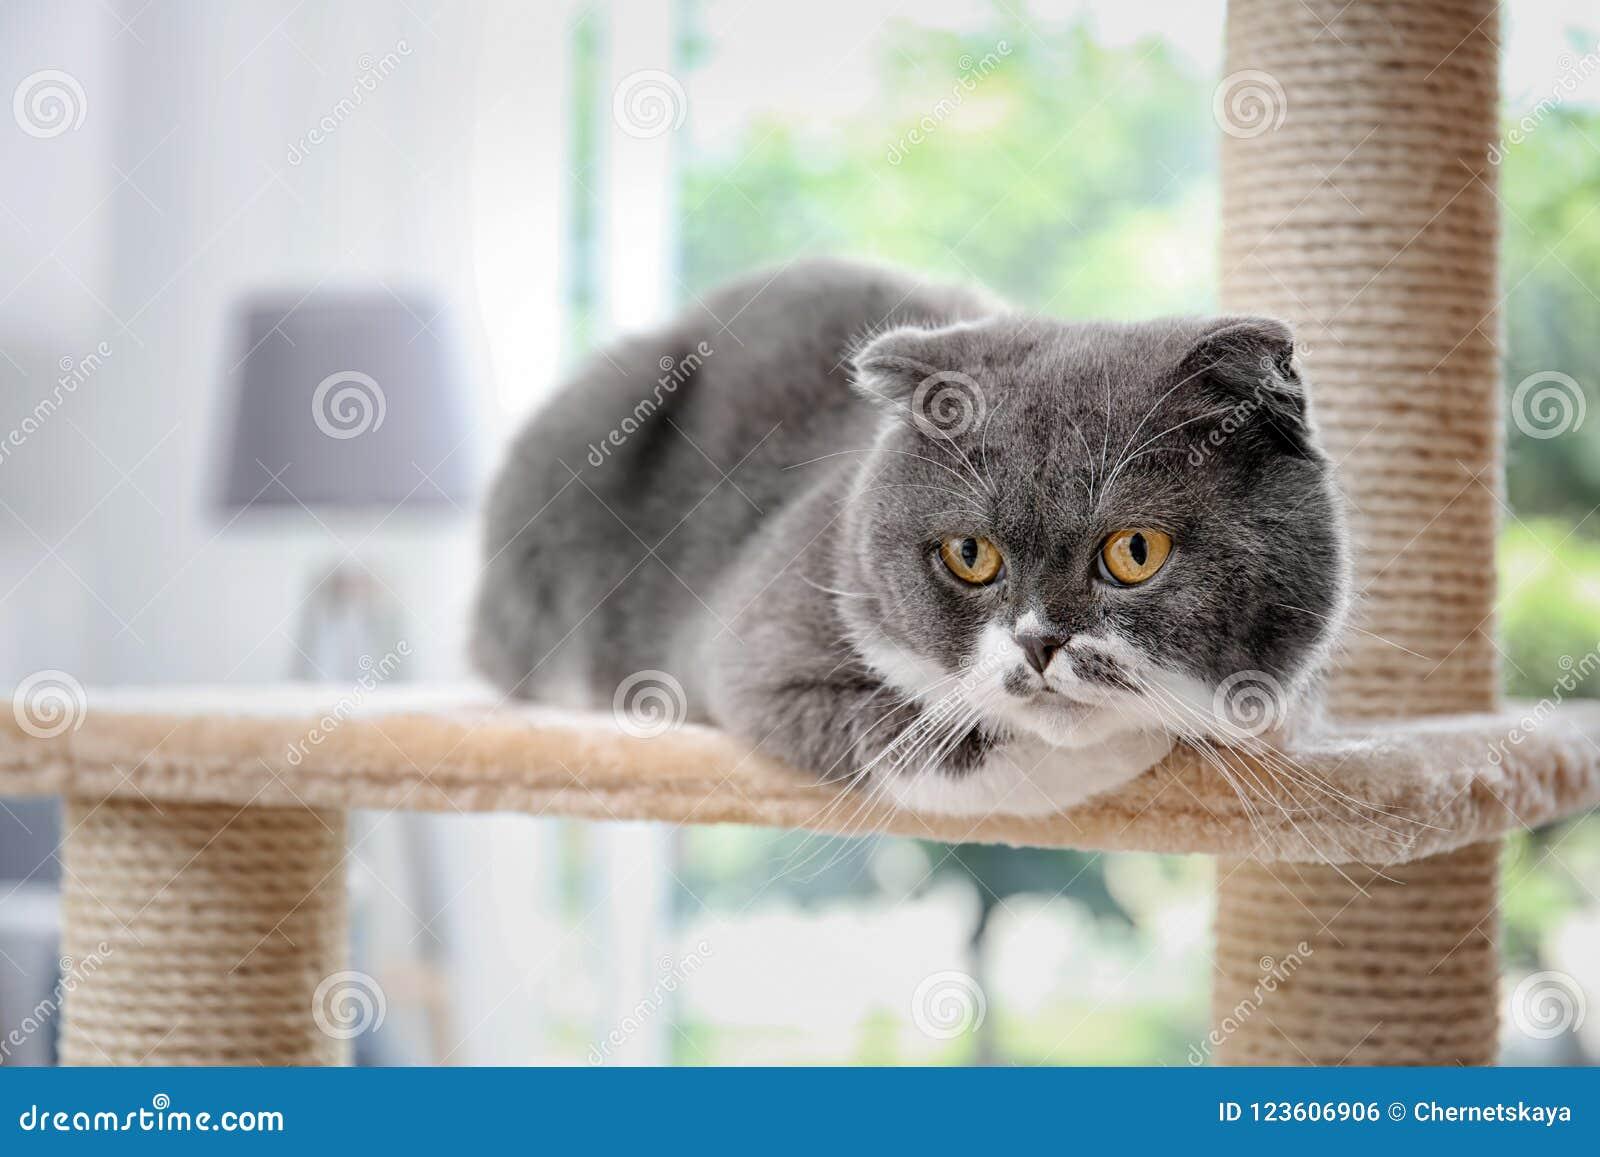 Cute pussycat on cat tree